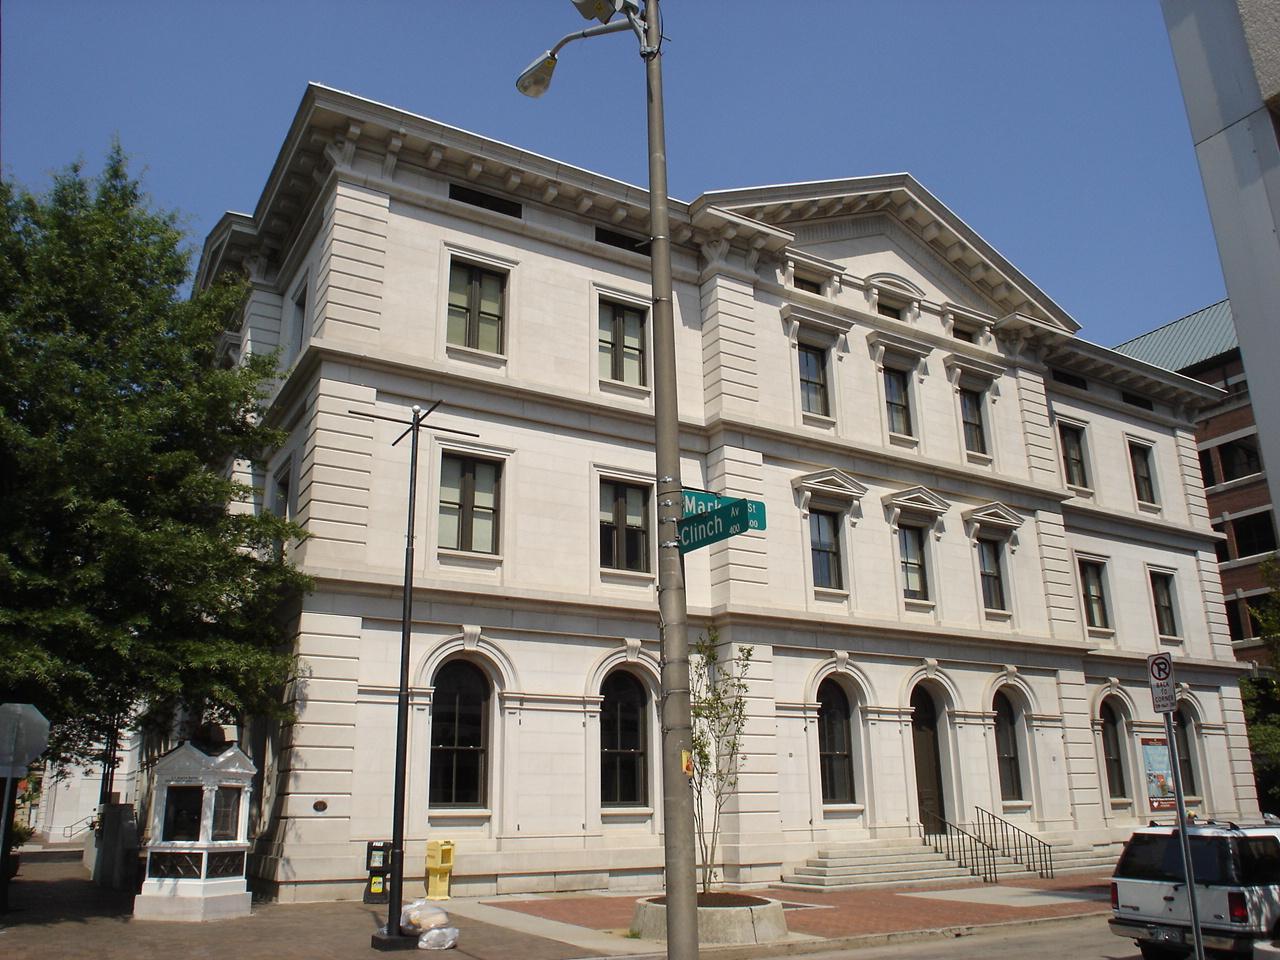 East TN History Center